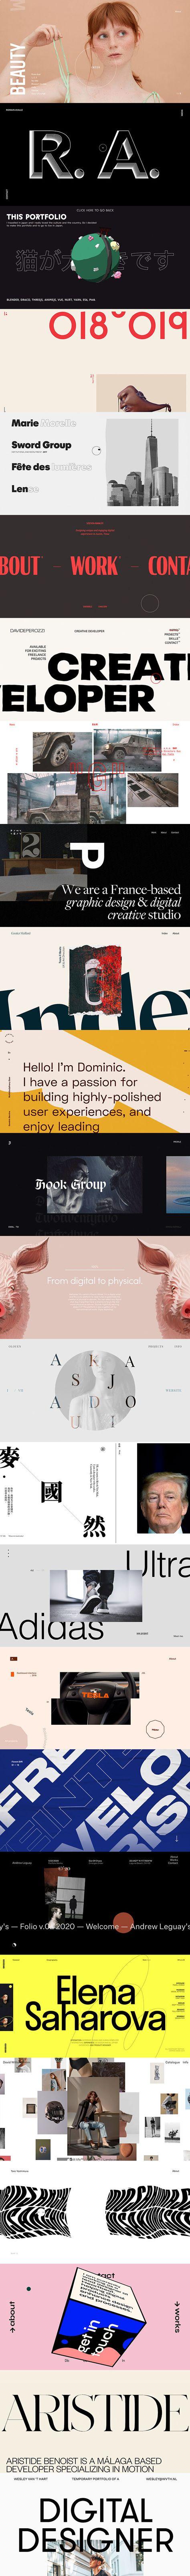 25 Creative Personal Portfolio Website Examples 2020